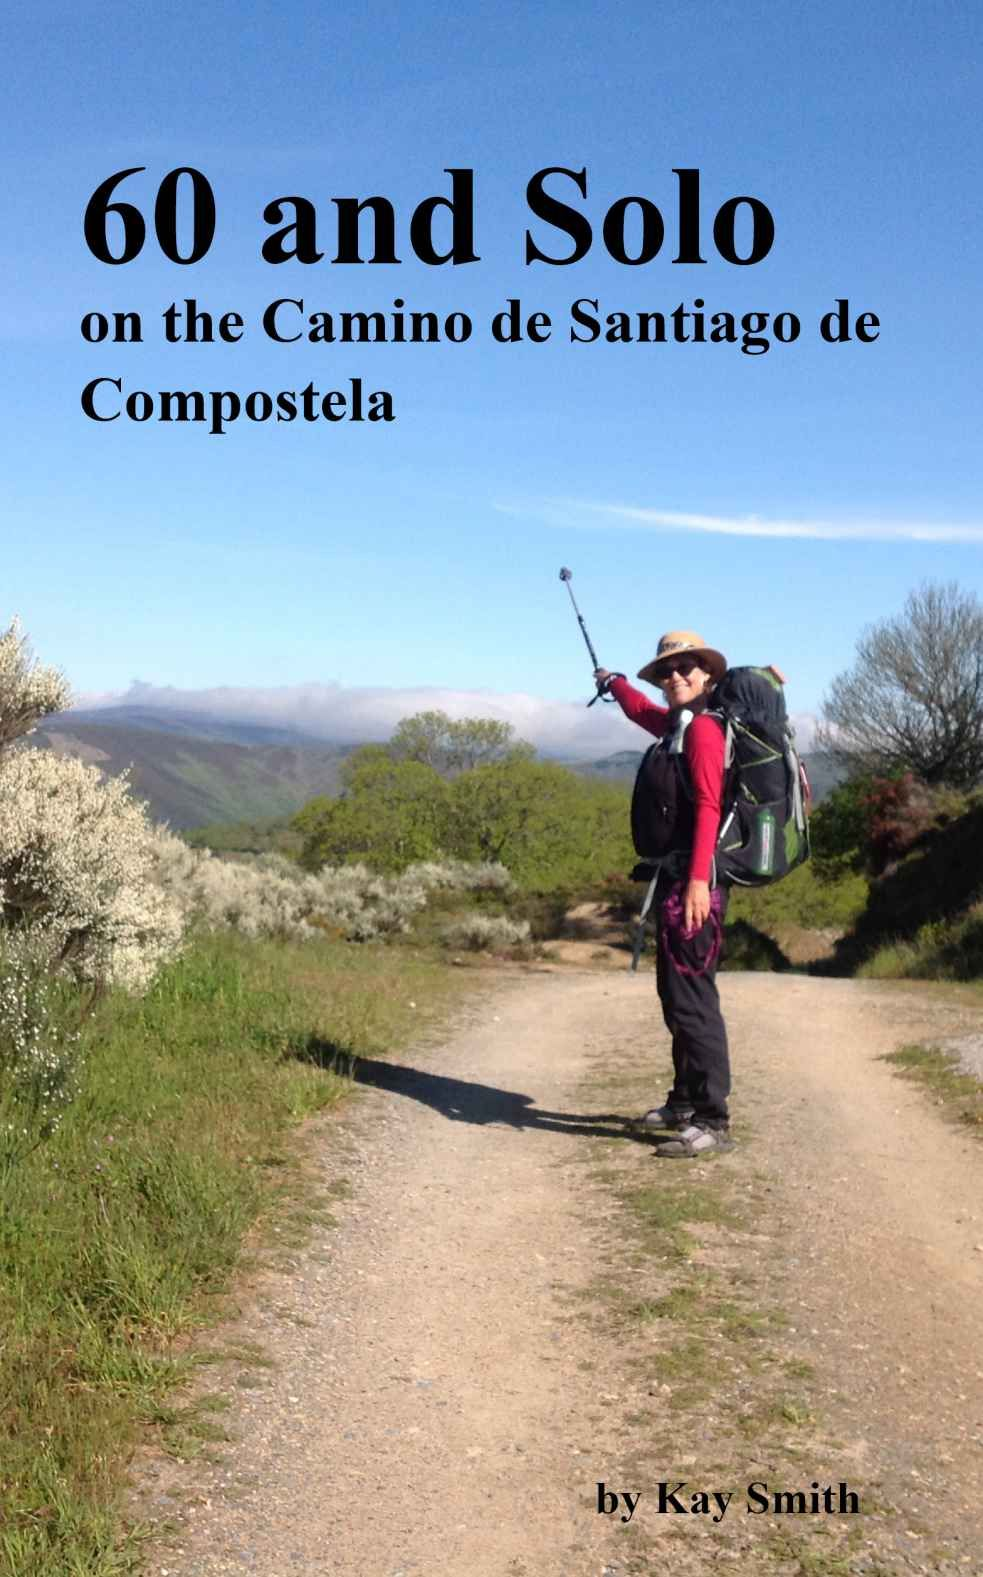 Amazon.com: 60 and Solo on the Camino de Santiago de Compostela eBook: Kay Smith: Kindle Store